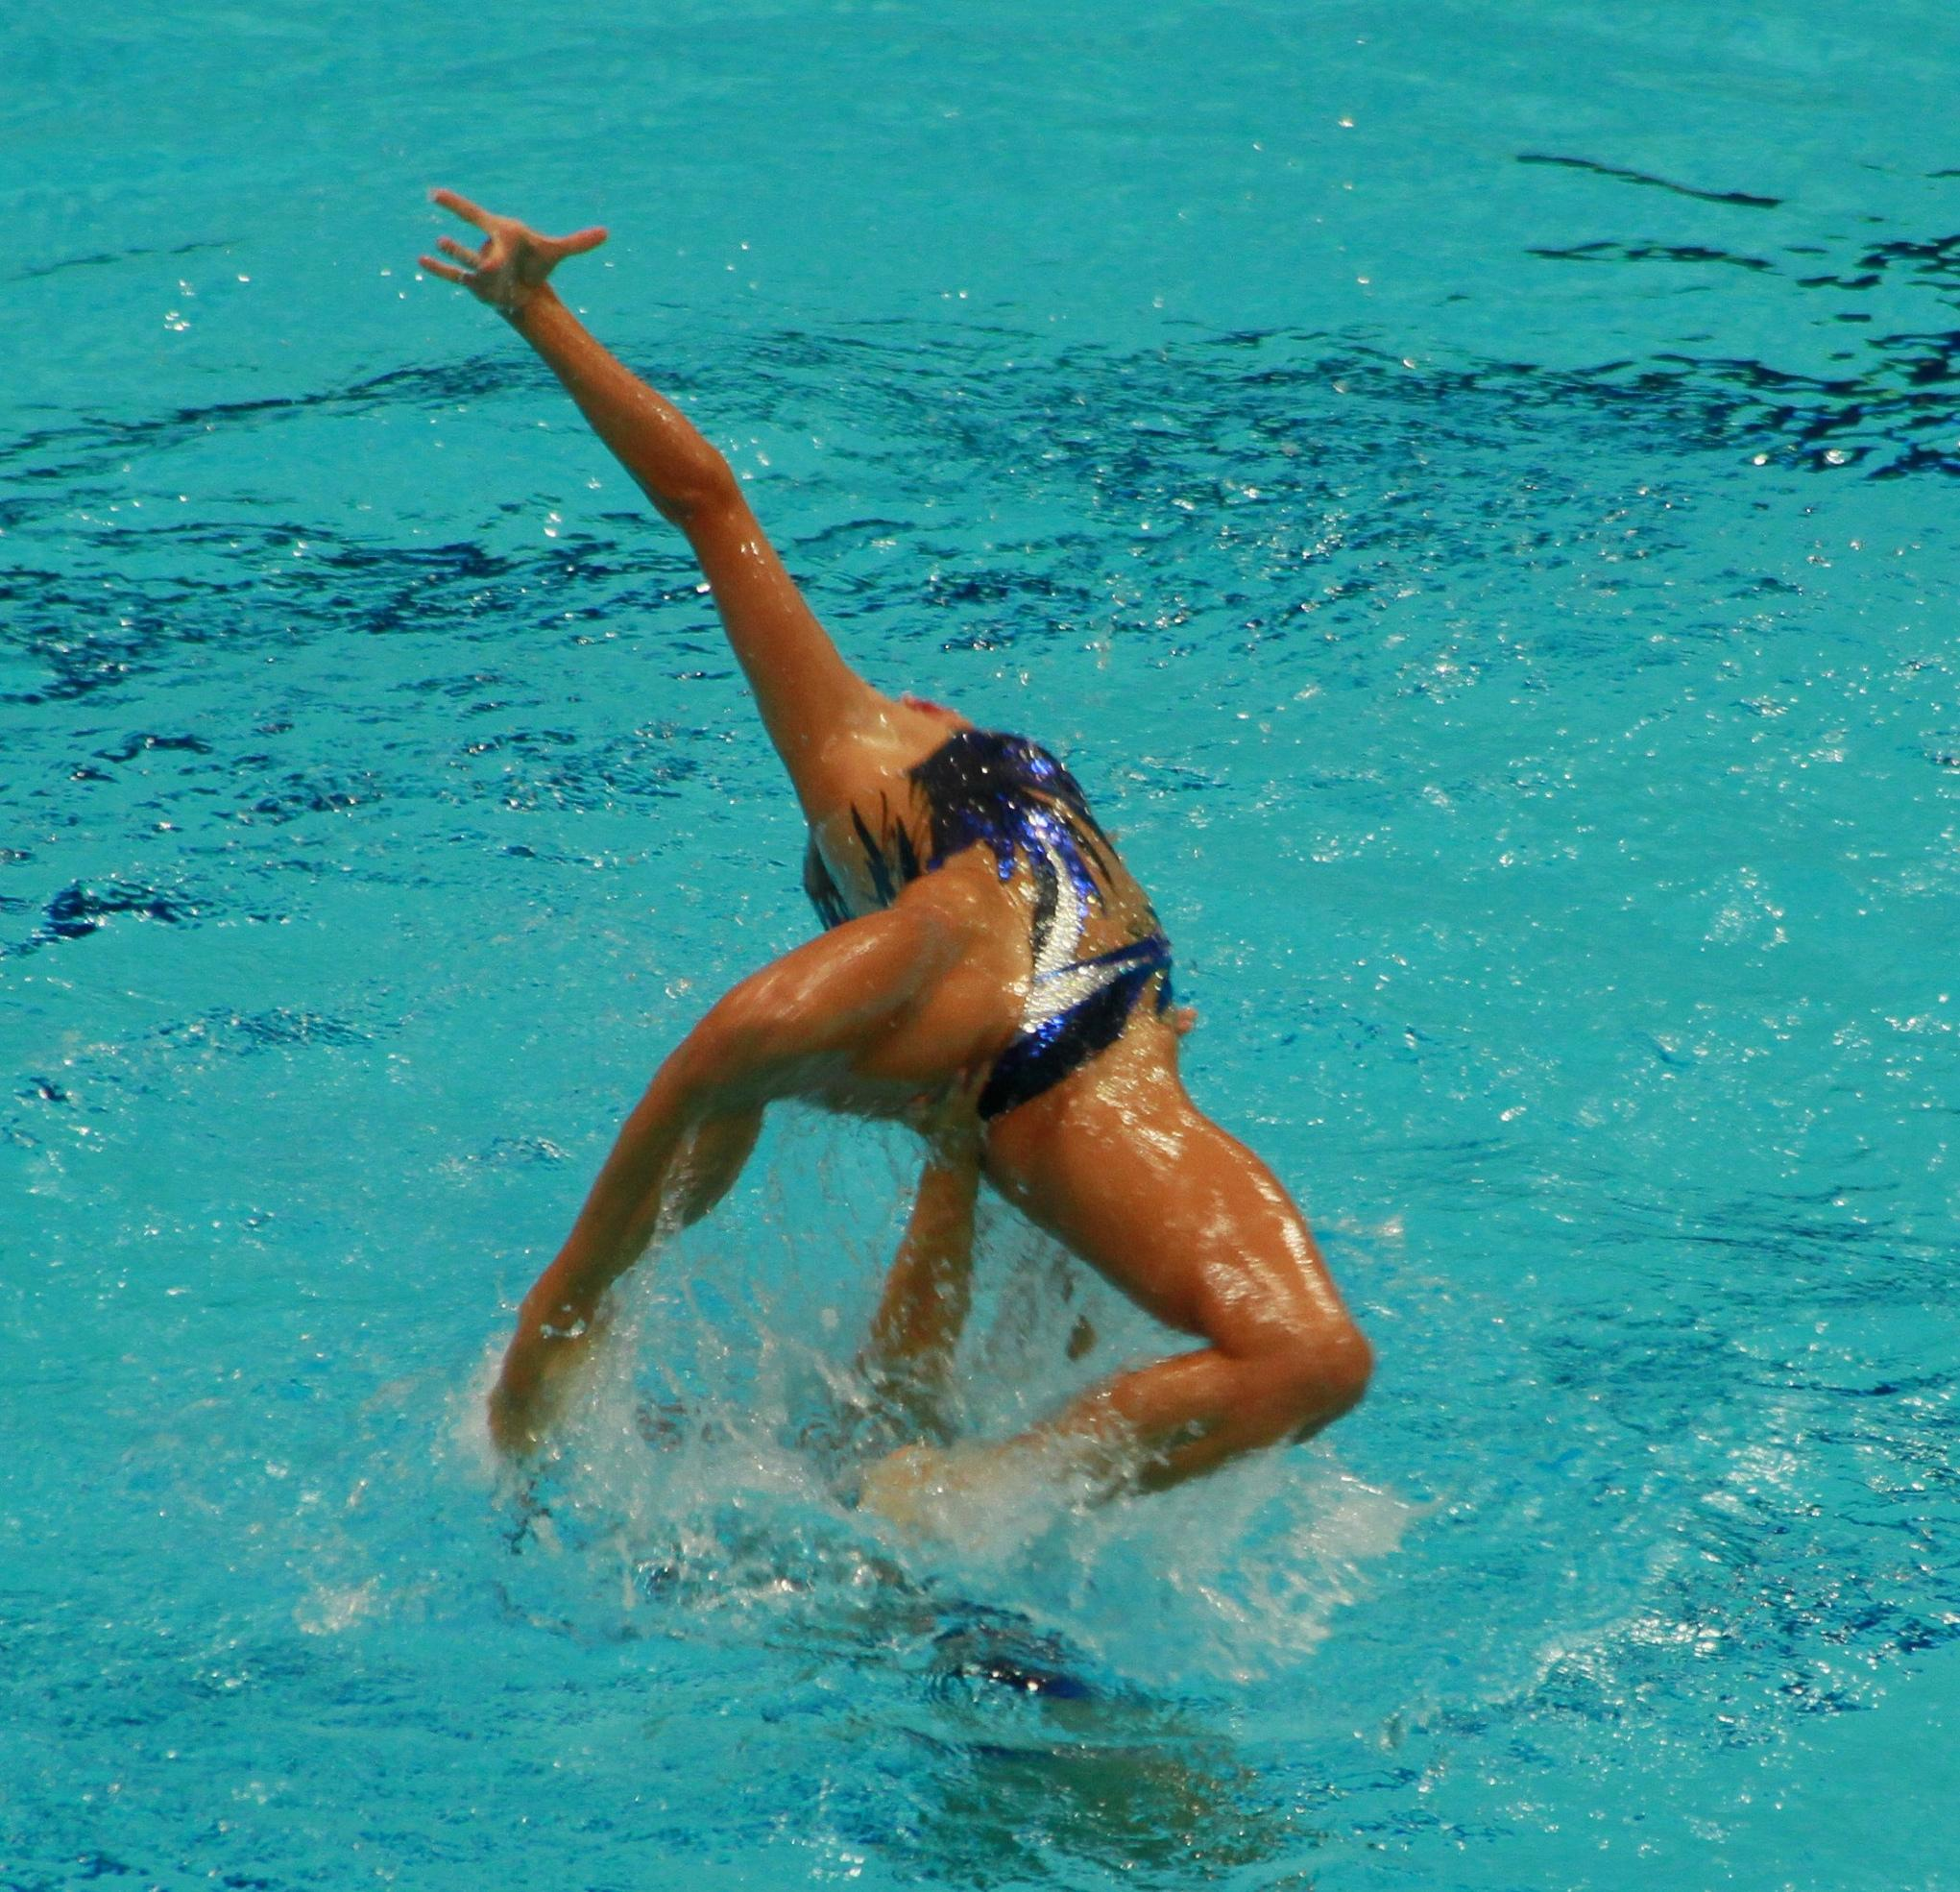 454704447_GreatBritainSynchronisedSwimming30_122_227lo.jpg